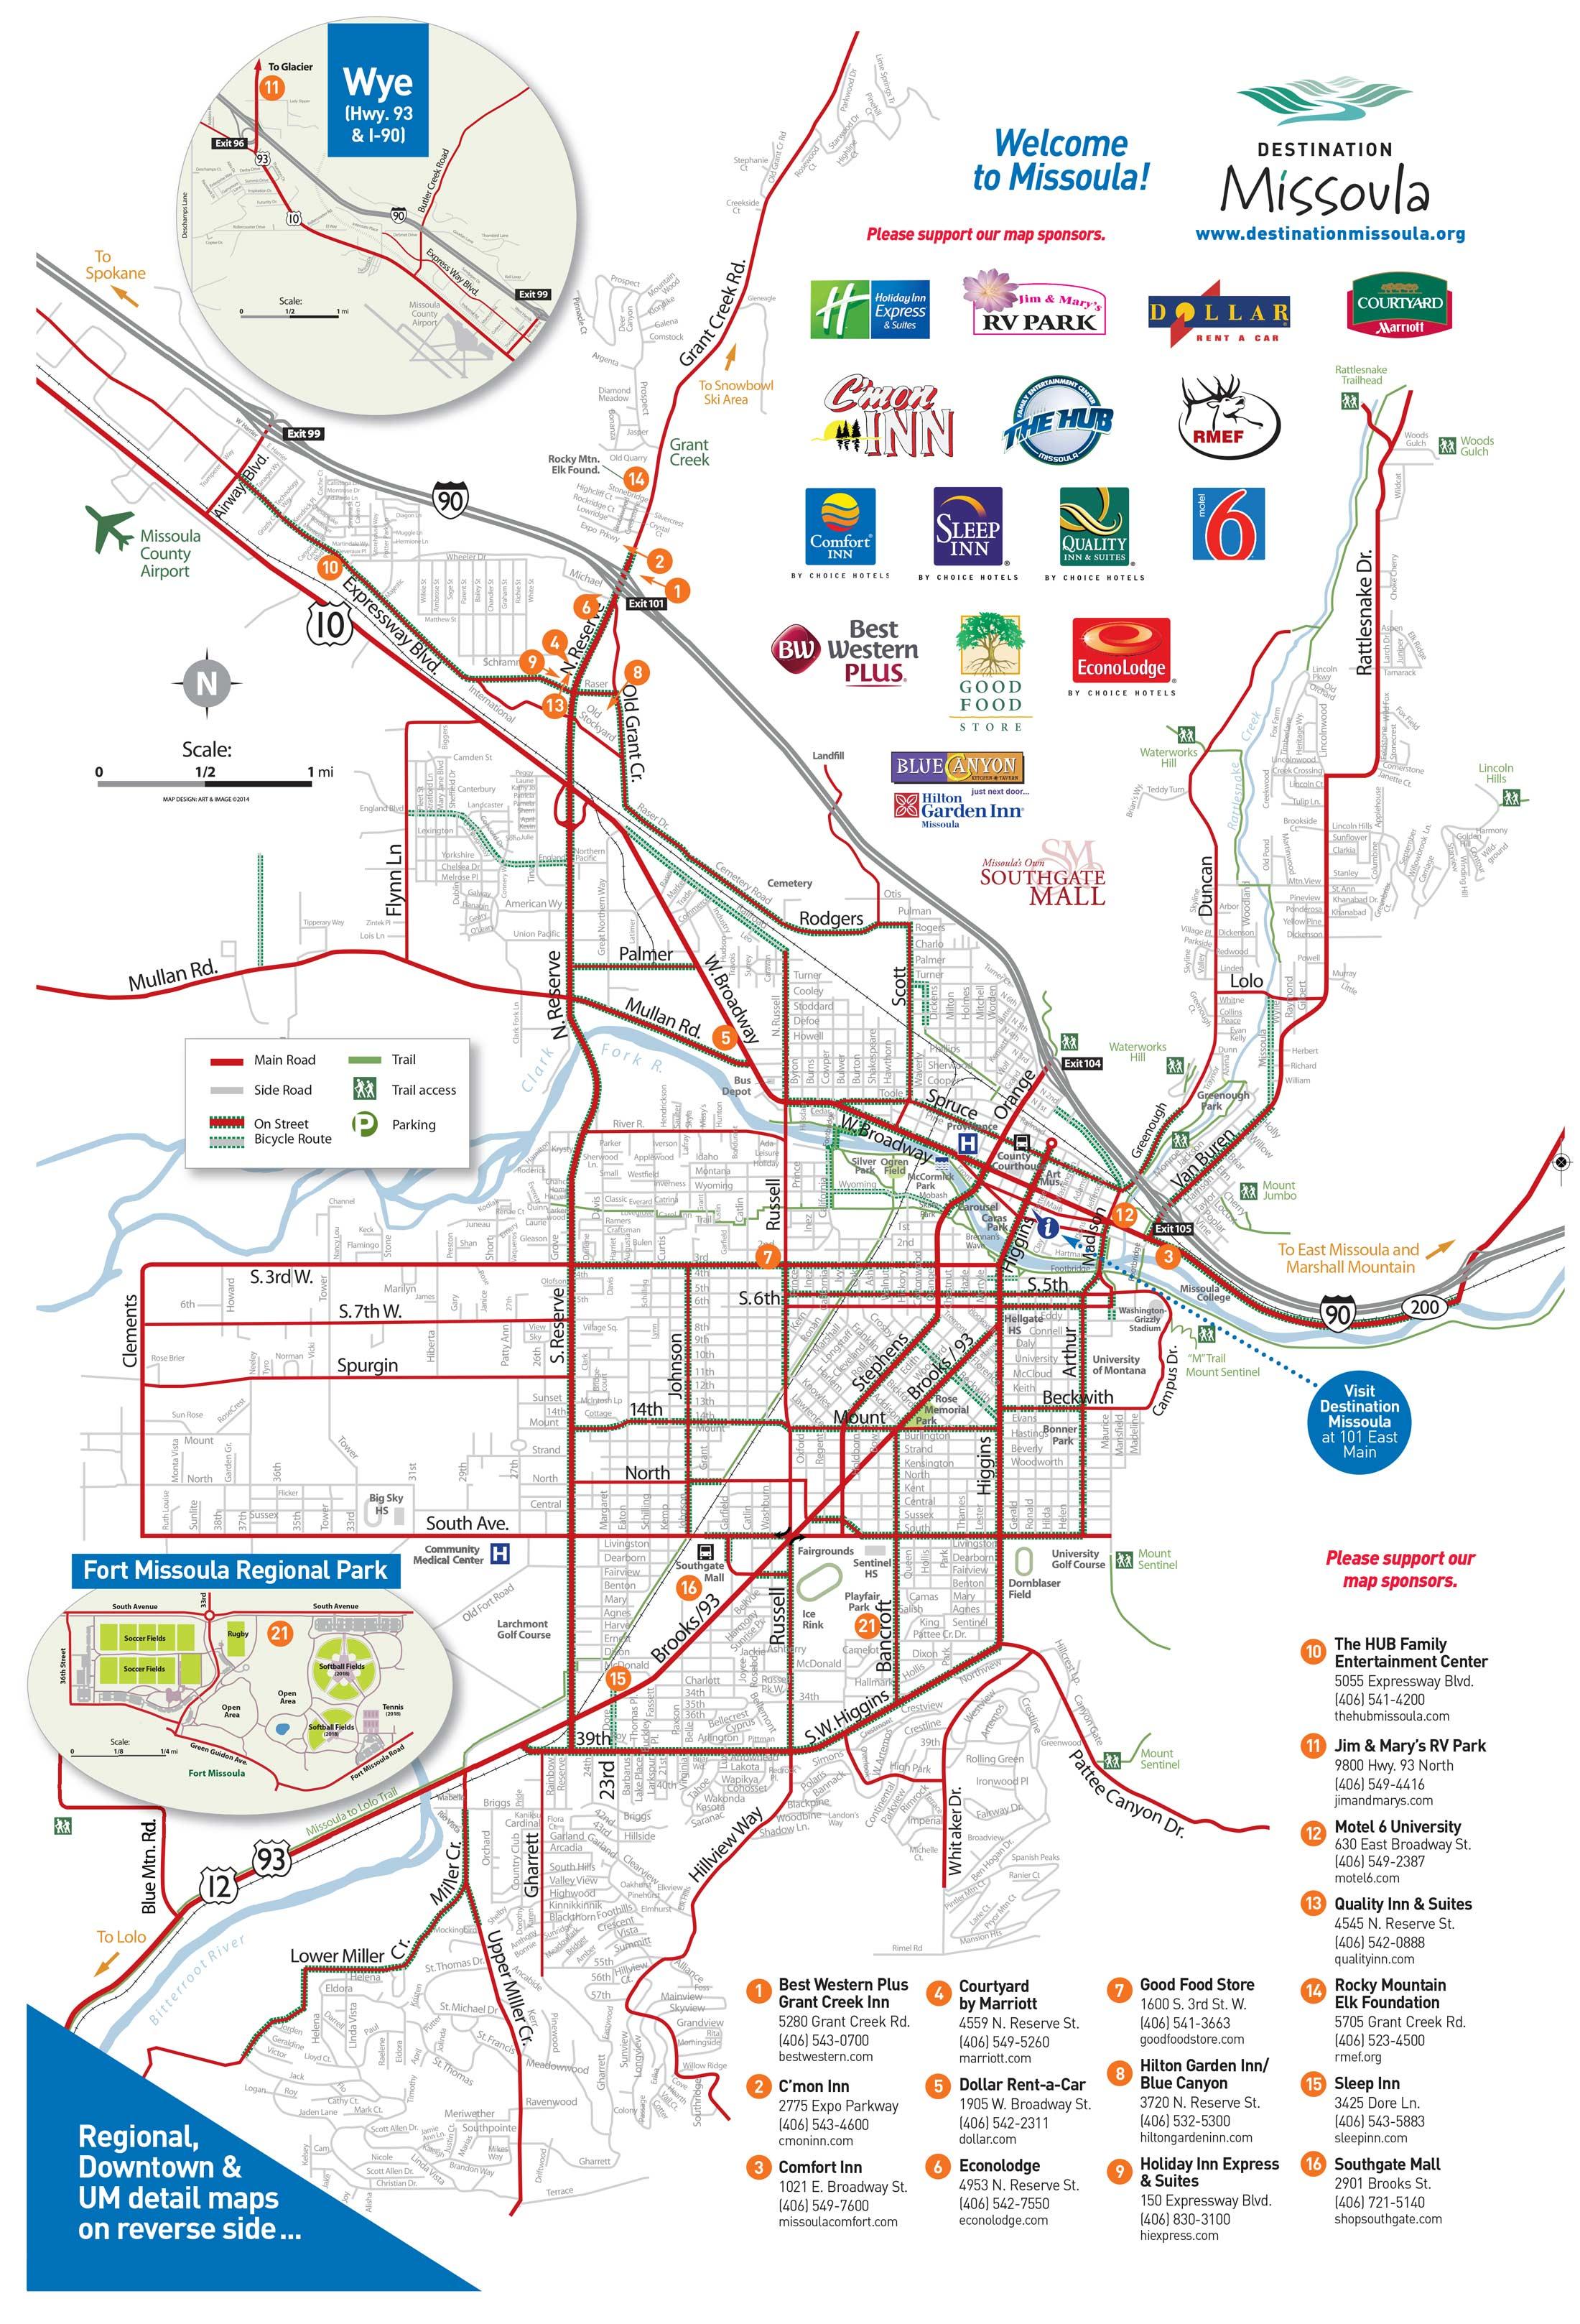 Missoula Montana Map Maps | Destination Missoula Missoula Montana Map